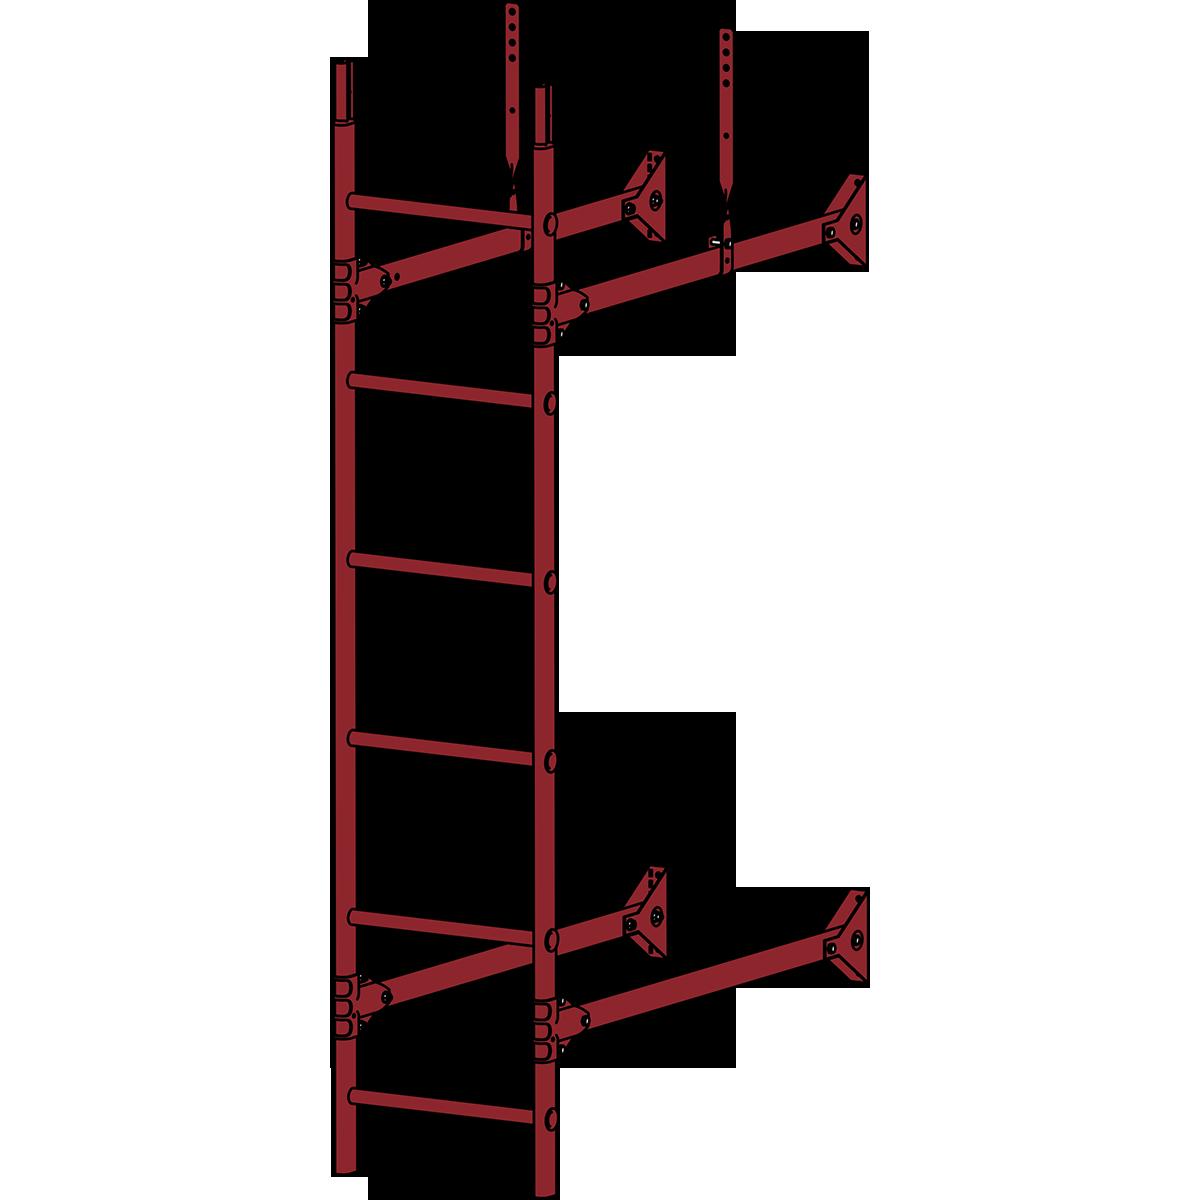 Лестница стеновая ROOFSYSTEMS PRESTIGE ZN 1,2 м RAL 3011 Коричнево-красный